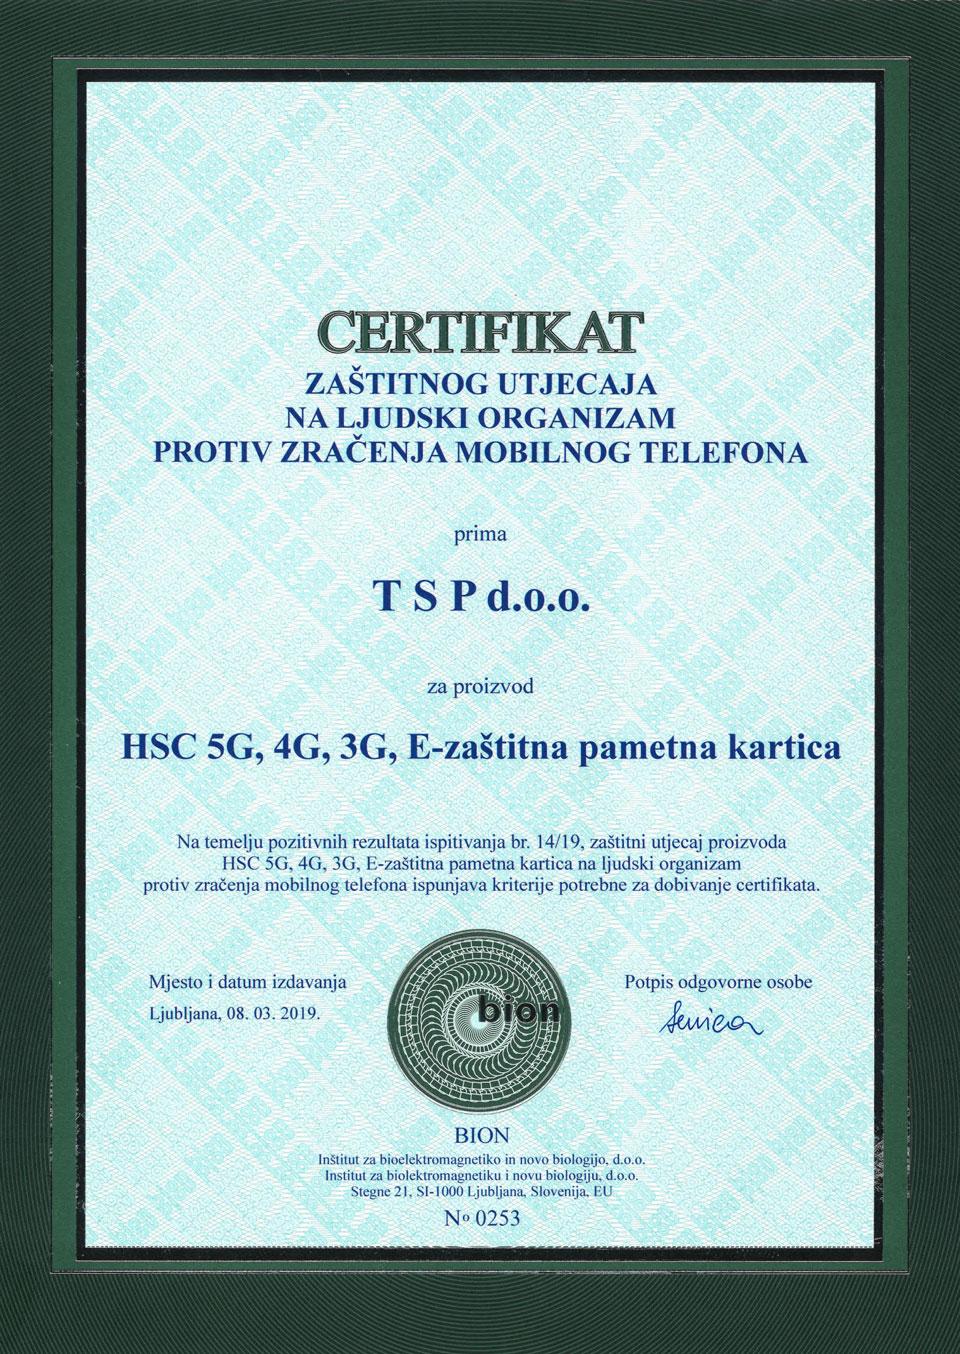 HSC smart card certifikat